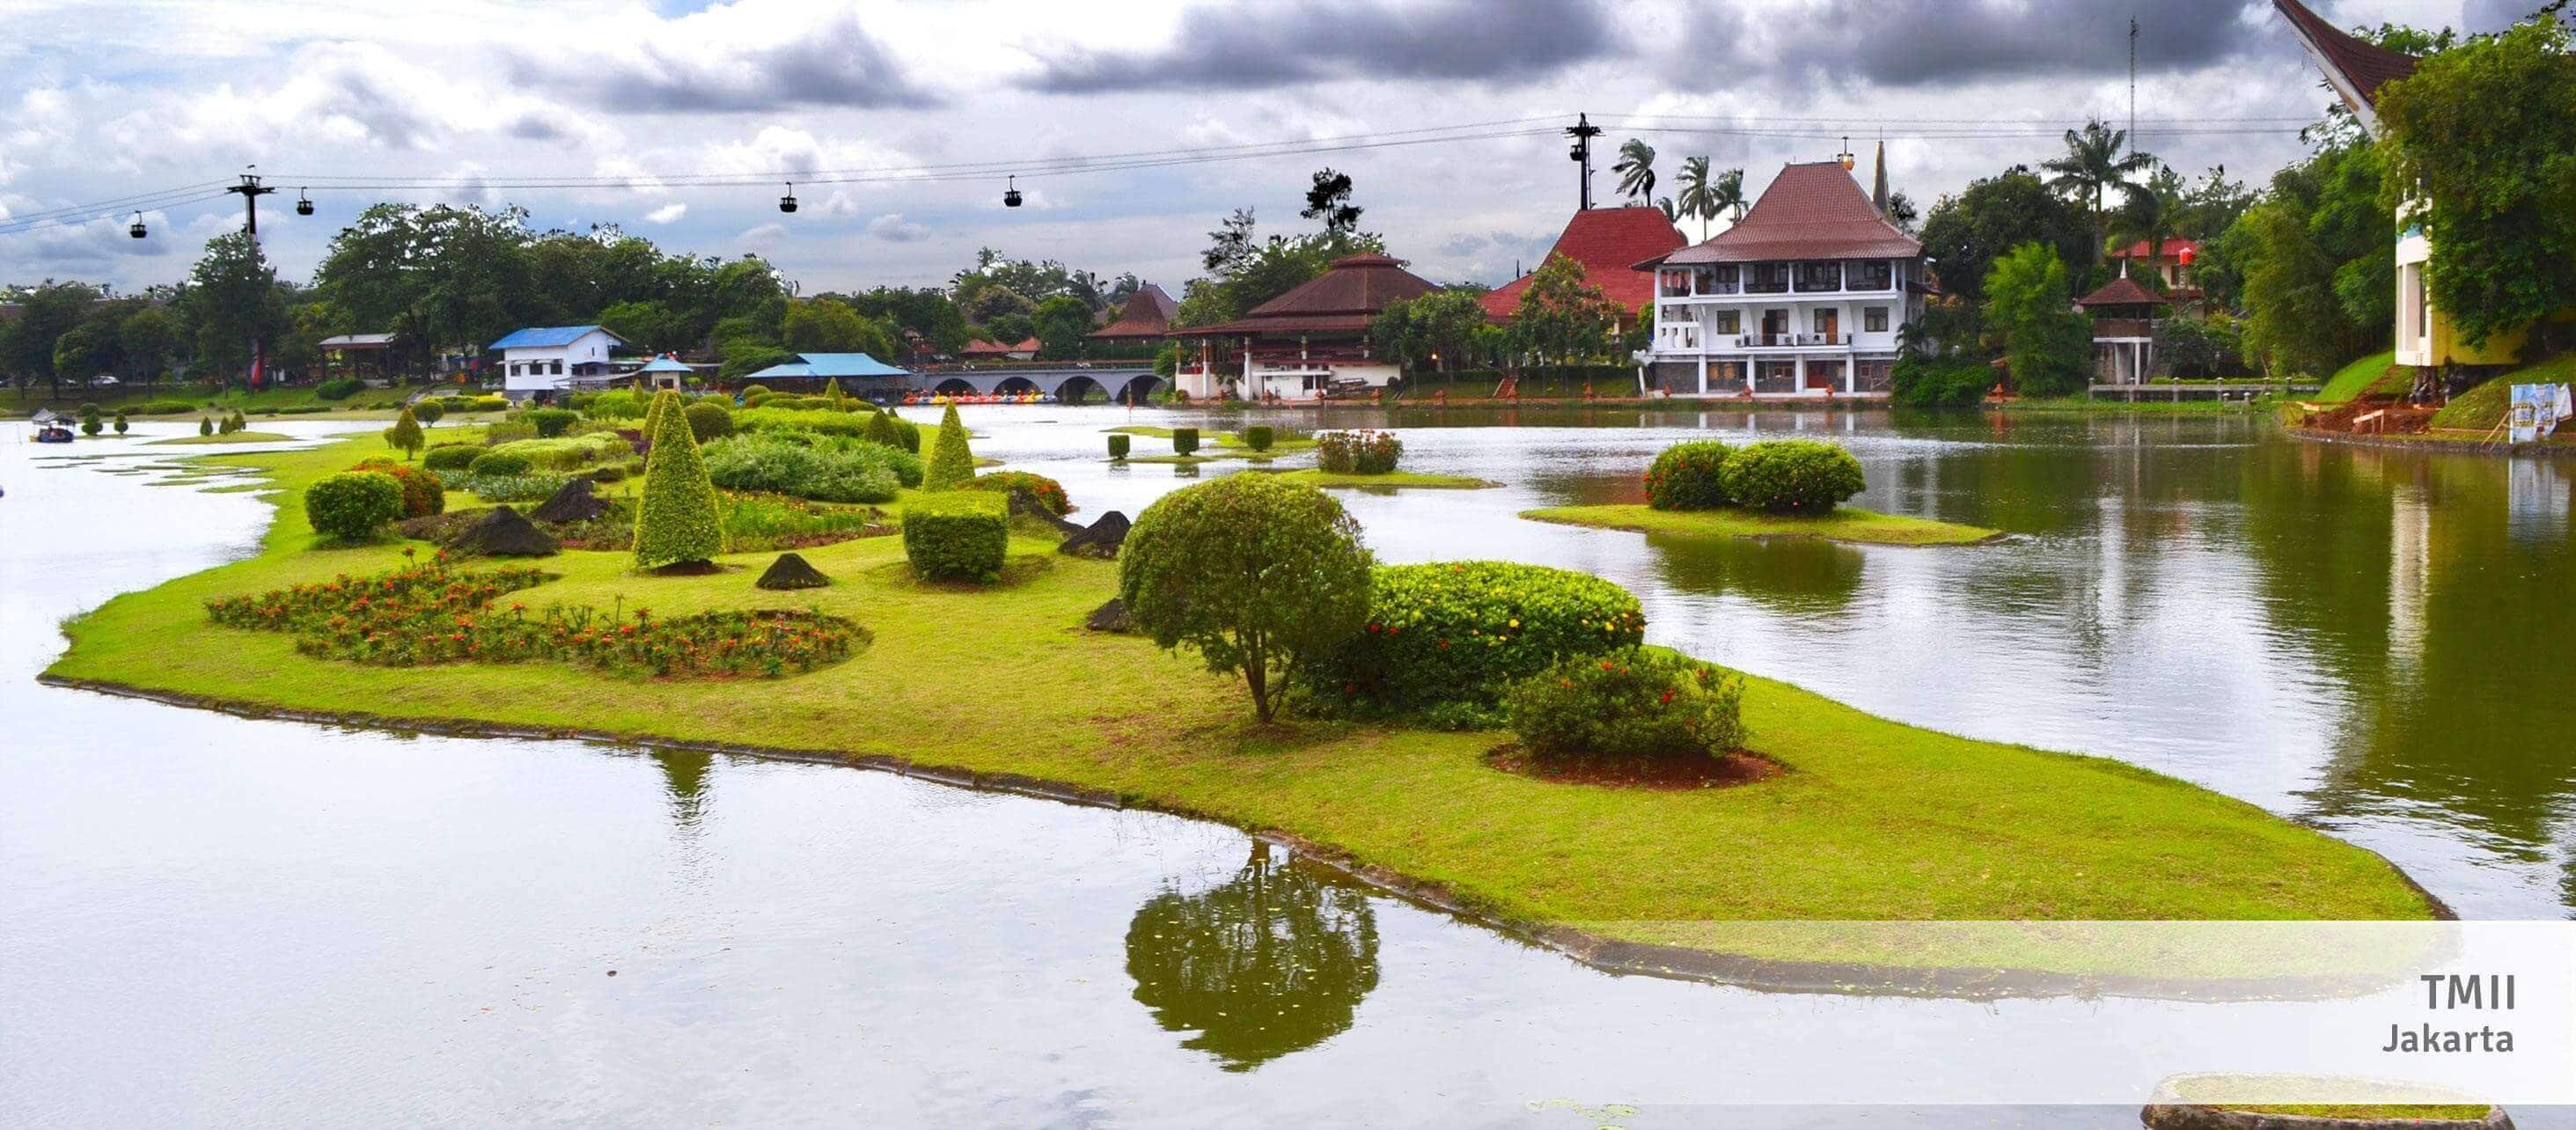 Jakarta: Indonesia's Capital of Splendors